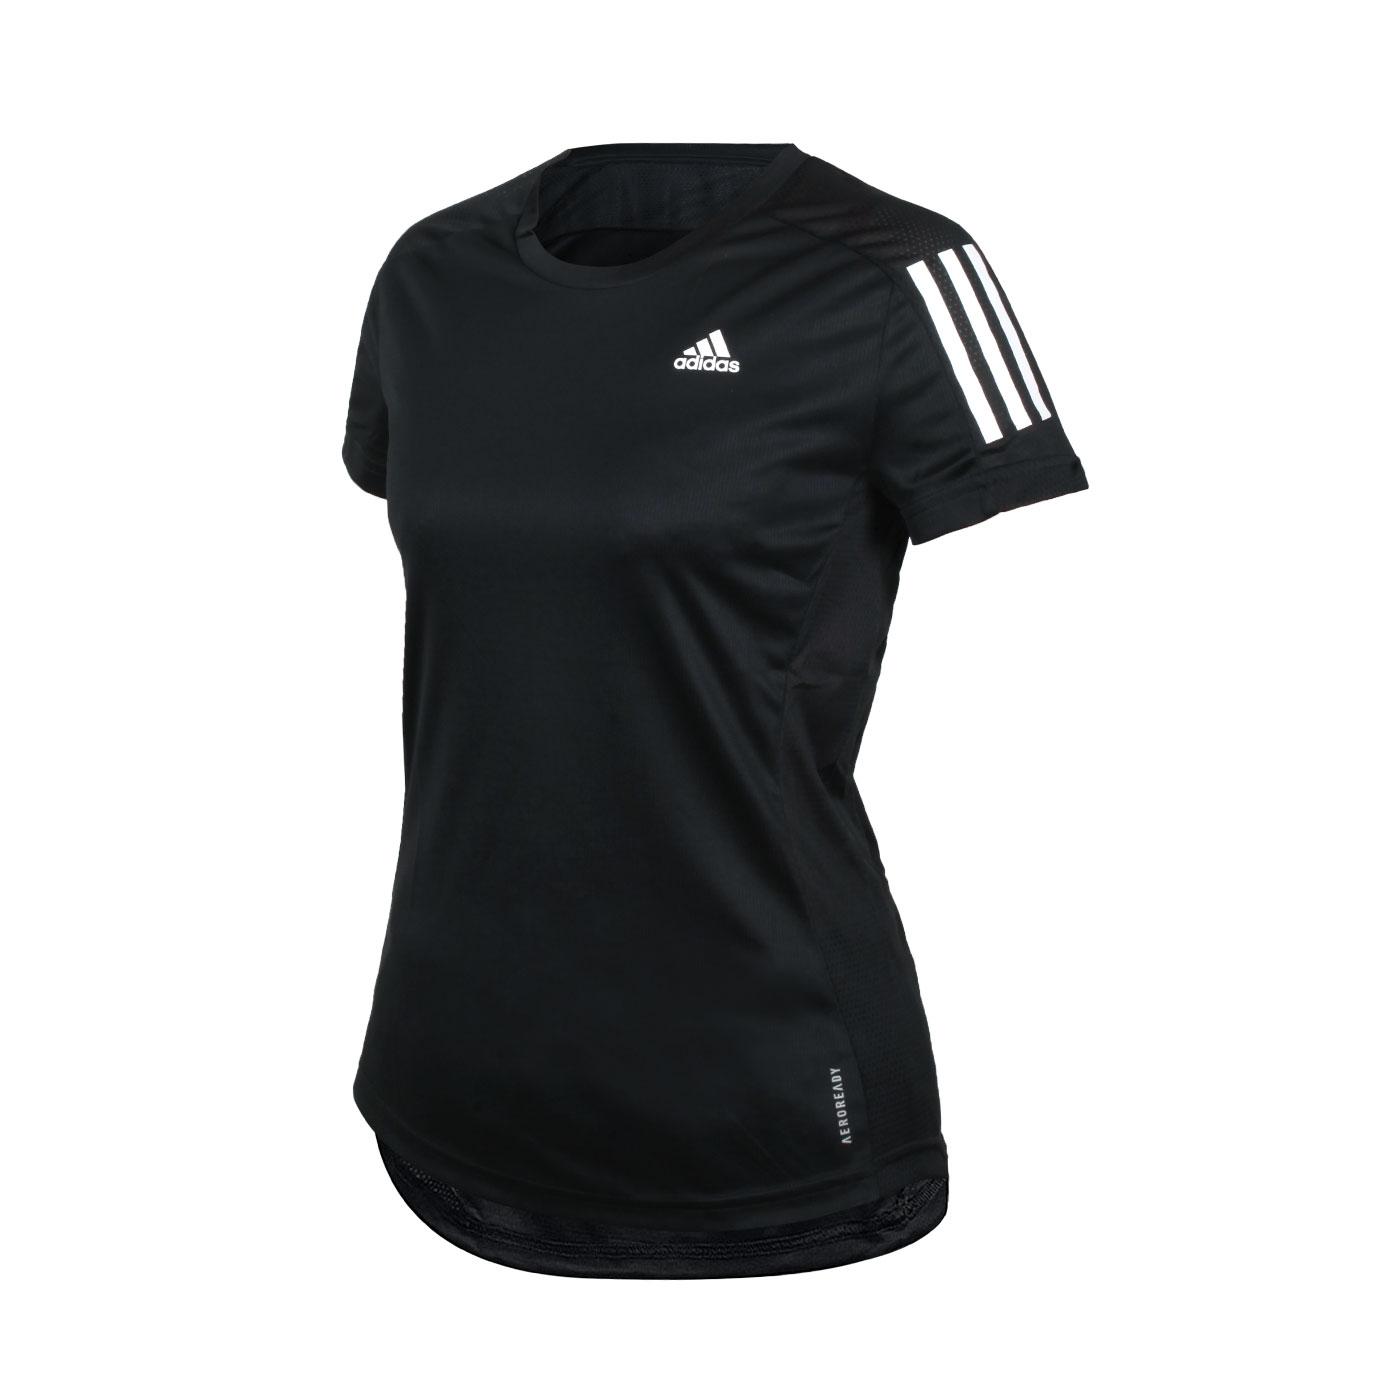 ADIDAS 女款短袖T恤 FS9830